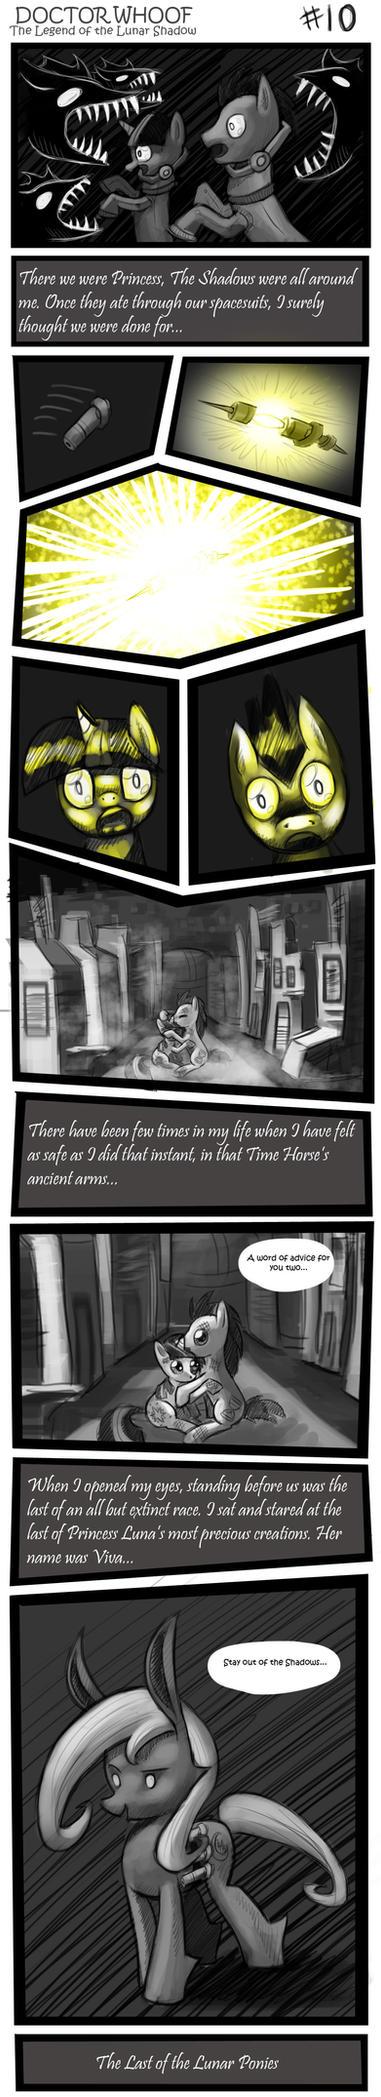 DOCTOR WHOOF Lunar Shadow 10 by CyberToaster